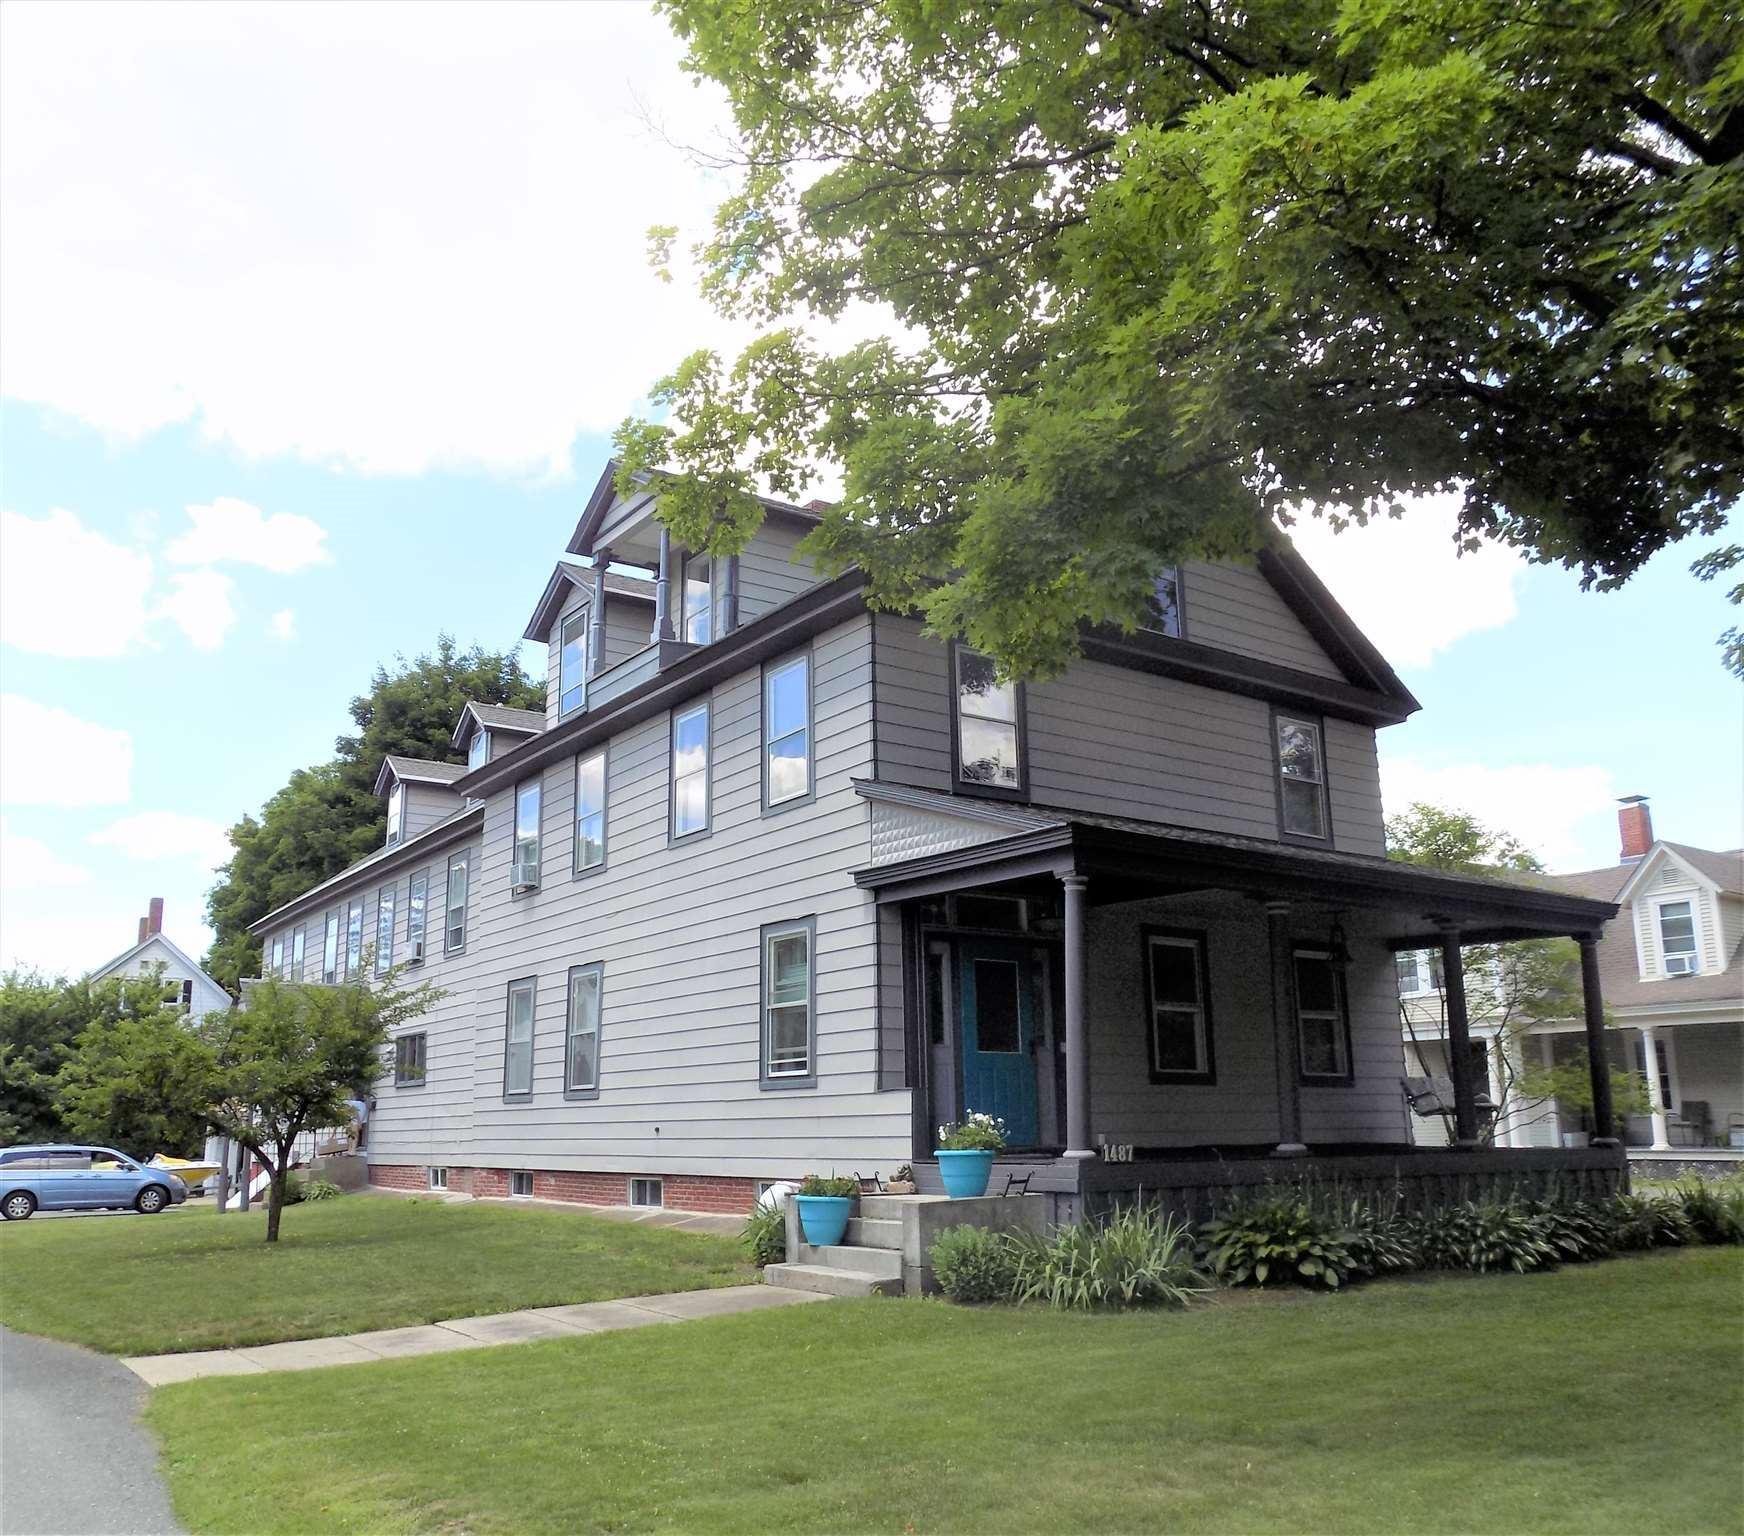 1487 Main Street, Saint Johnsbury, VT 05819 - MLS#: 4815376